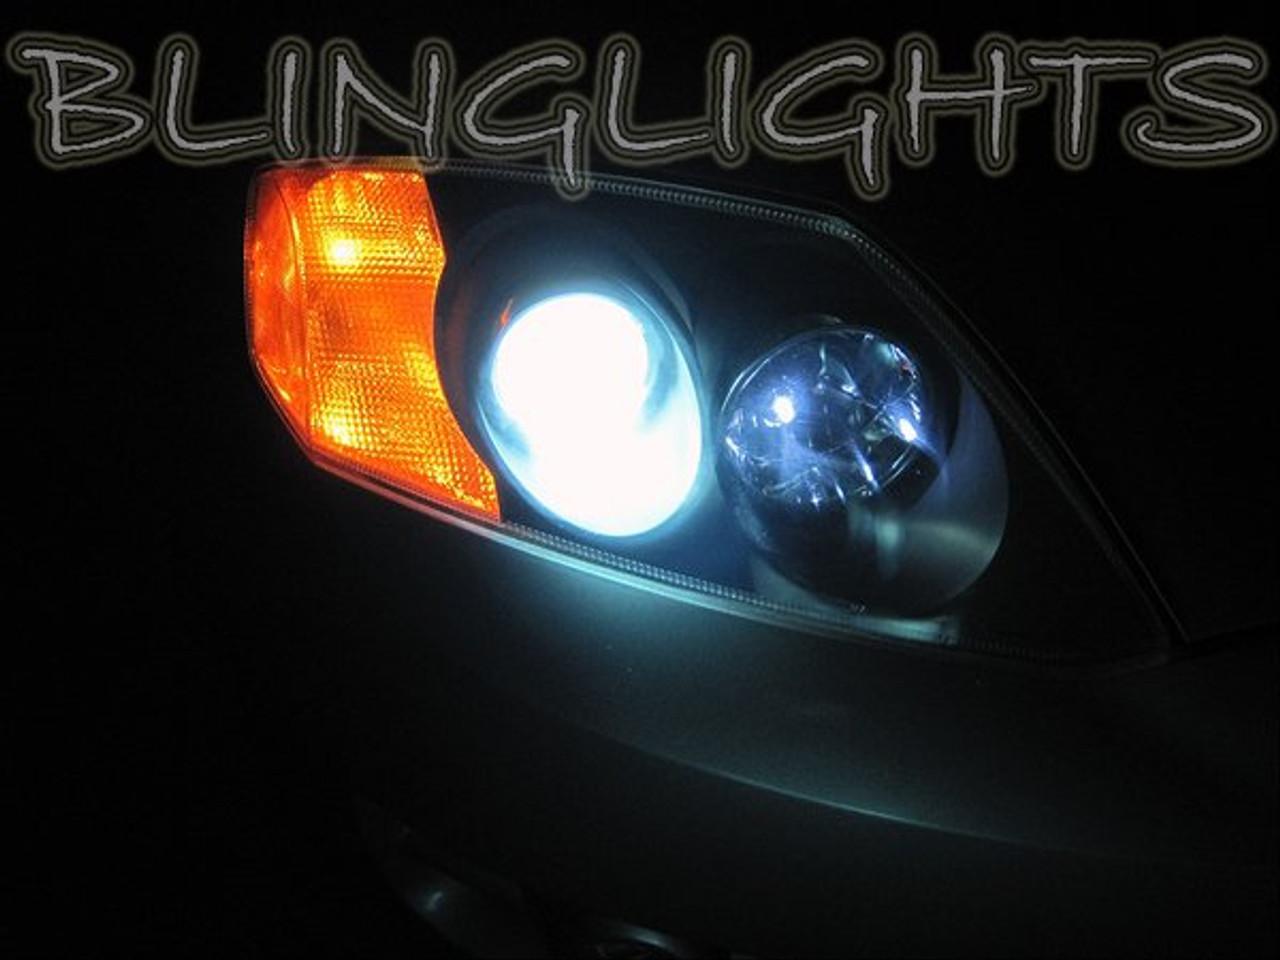 2006 tiburon headlight bulb